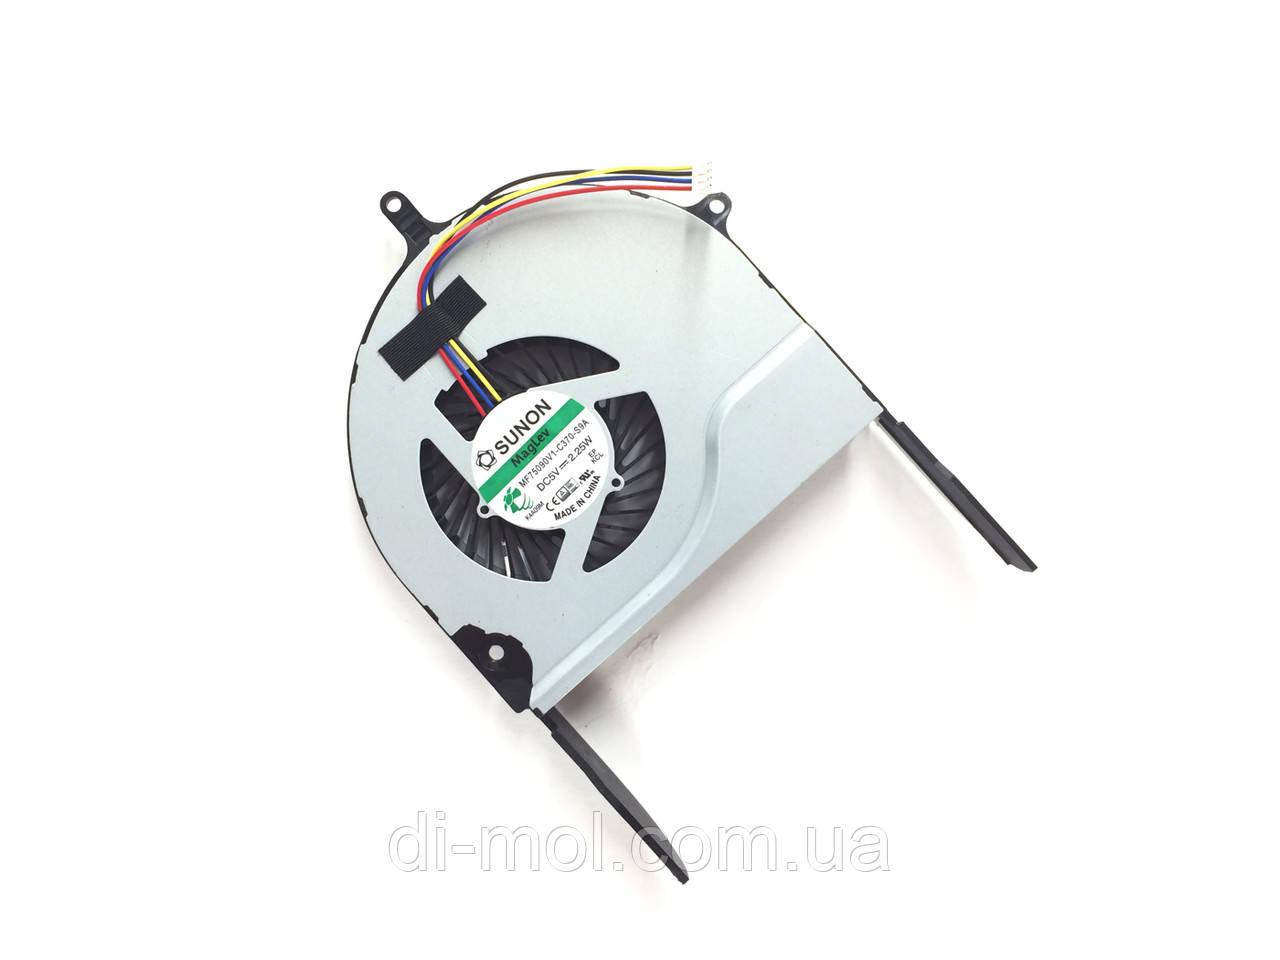 Вентилятор для ноутбука Asus N751JK series, 4-pin